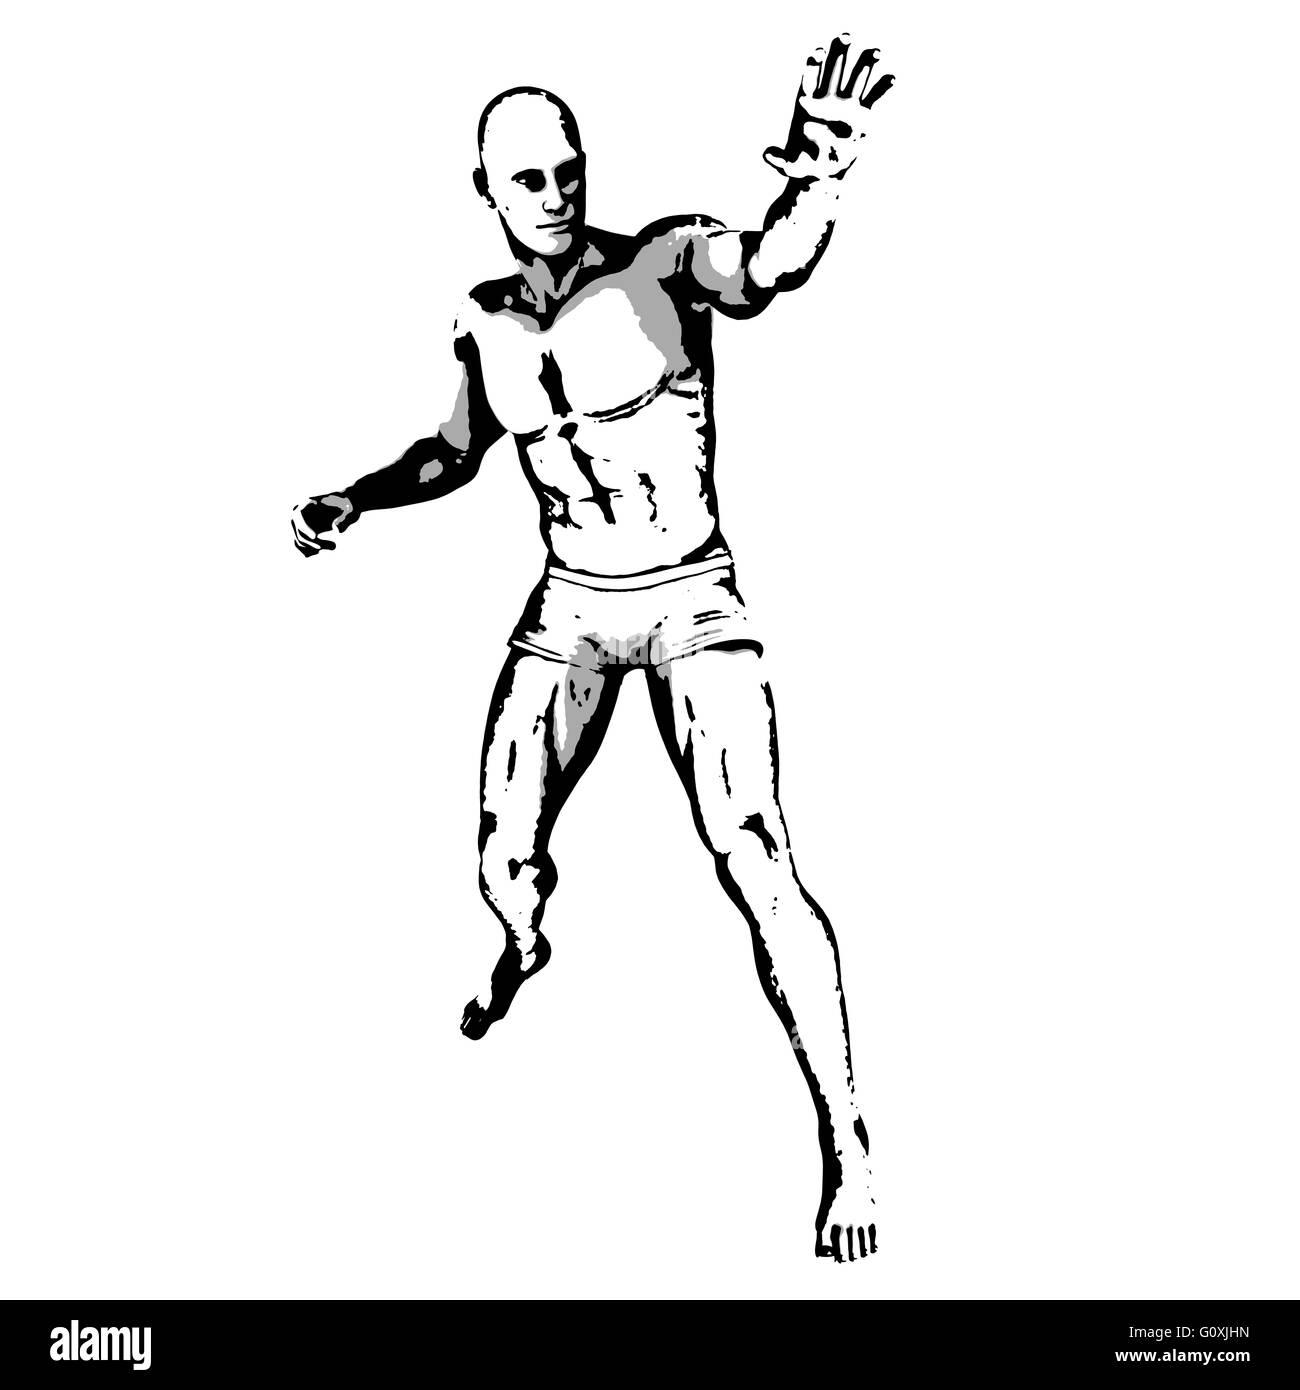 Comic Book Hero Pose in Sketch Ink Illustration - Stock Image